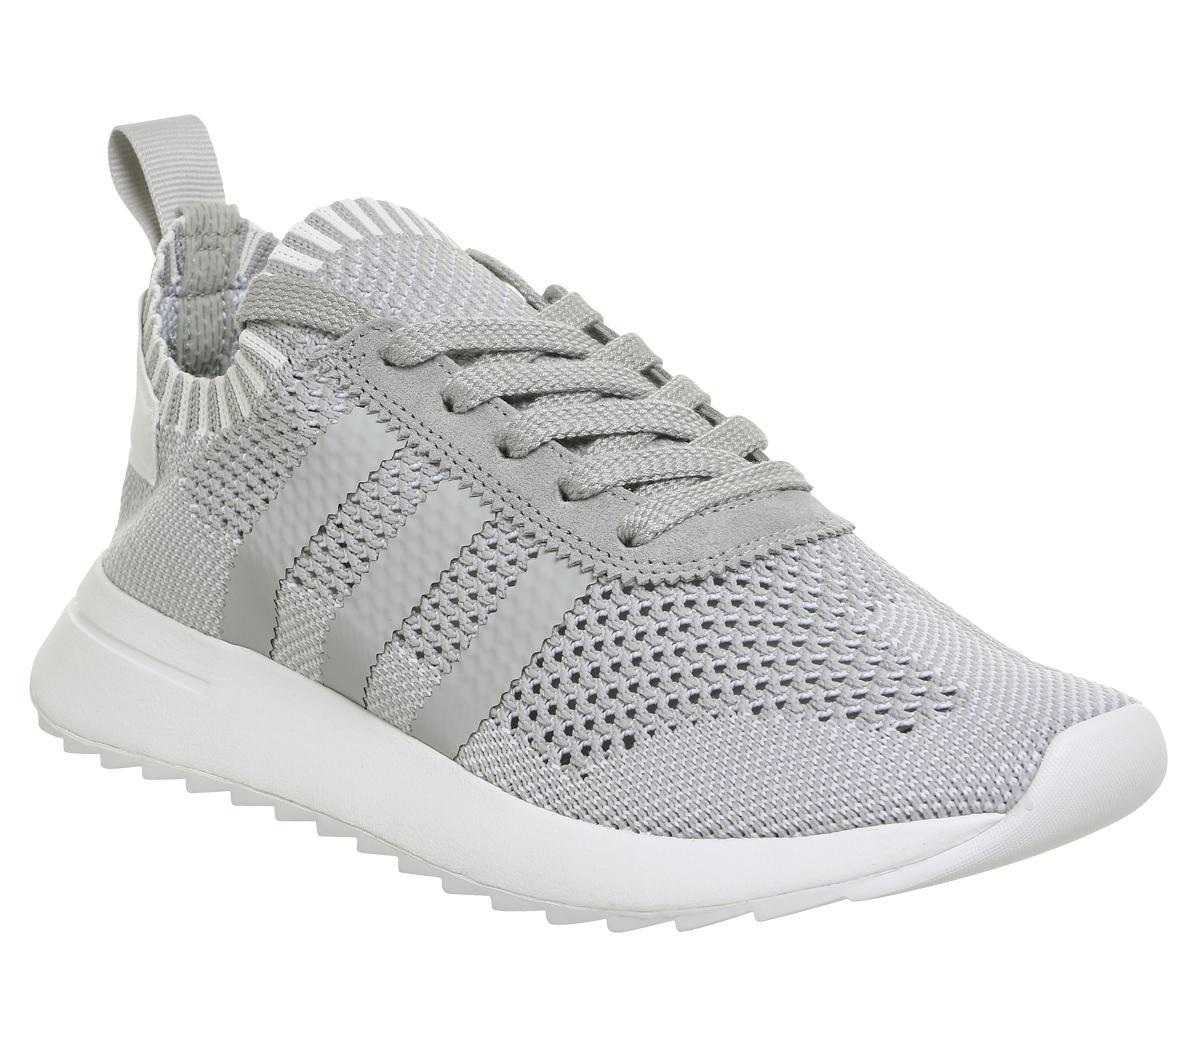 adidas Flashback Prime Knit Black White Sneaker damen